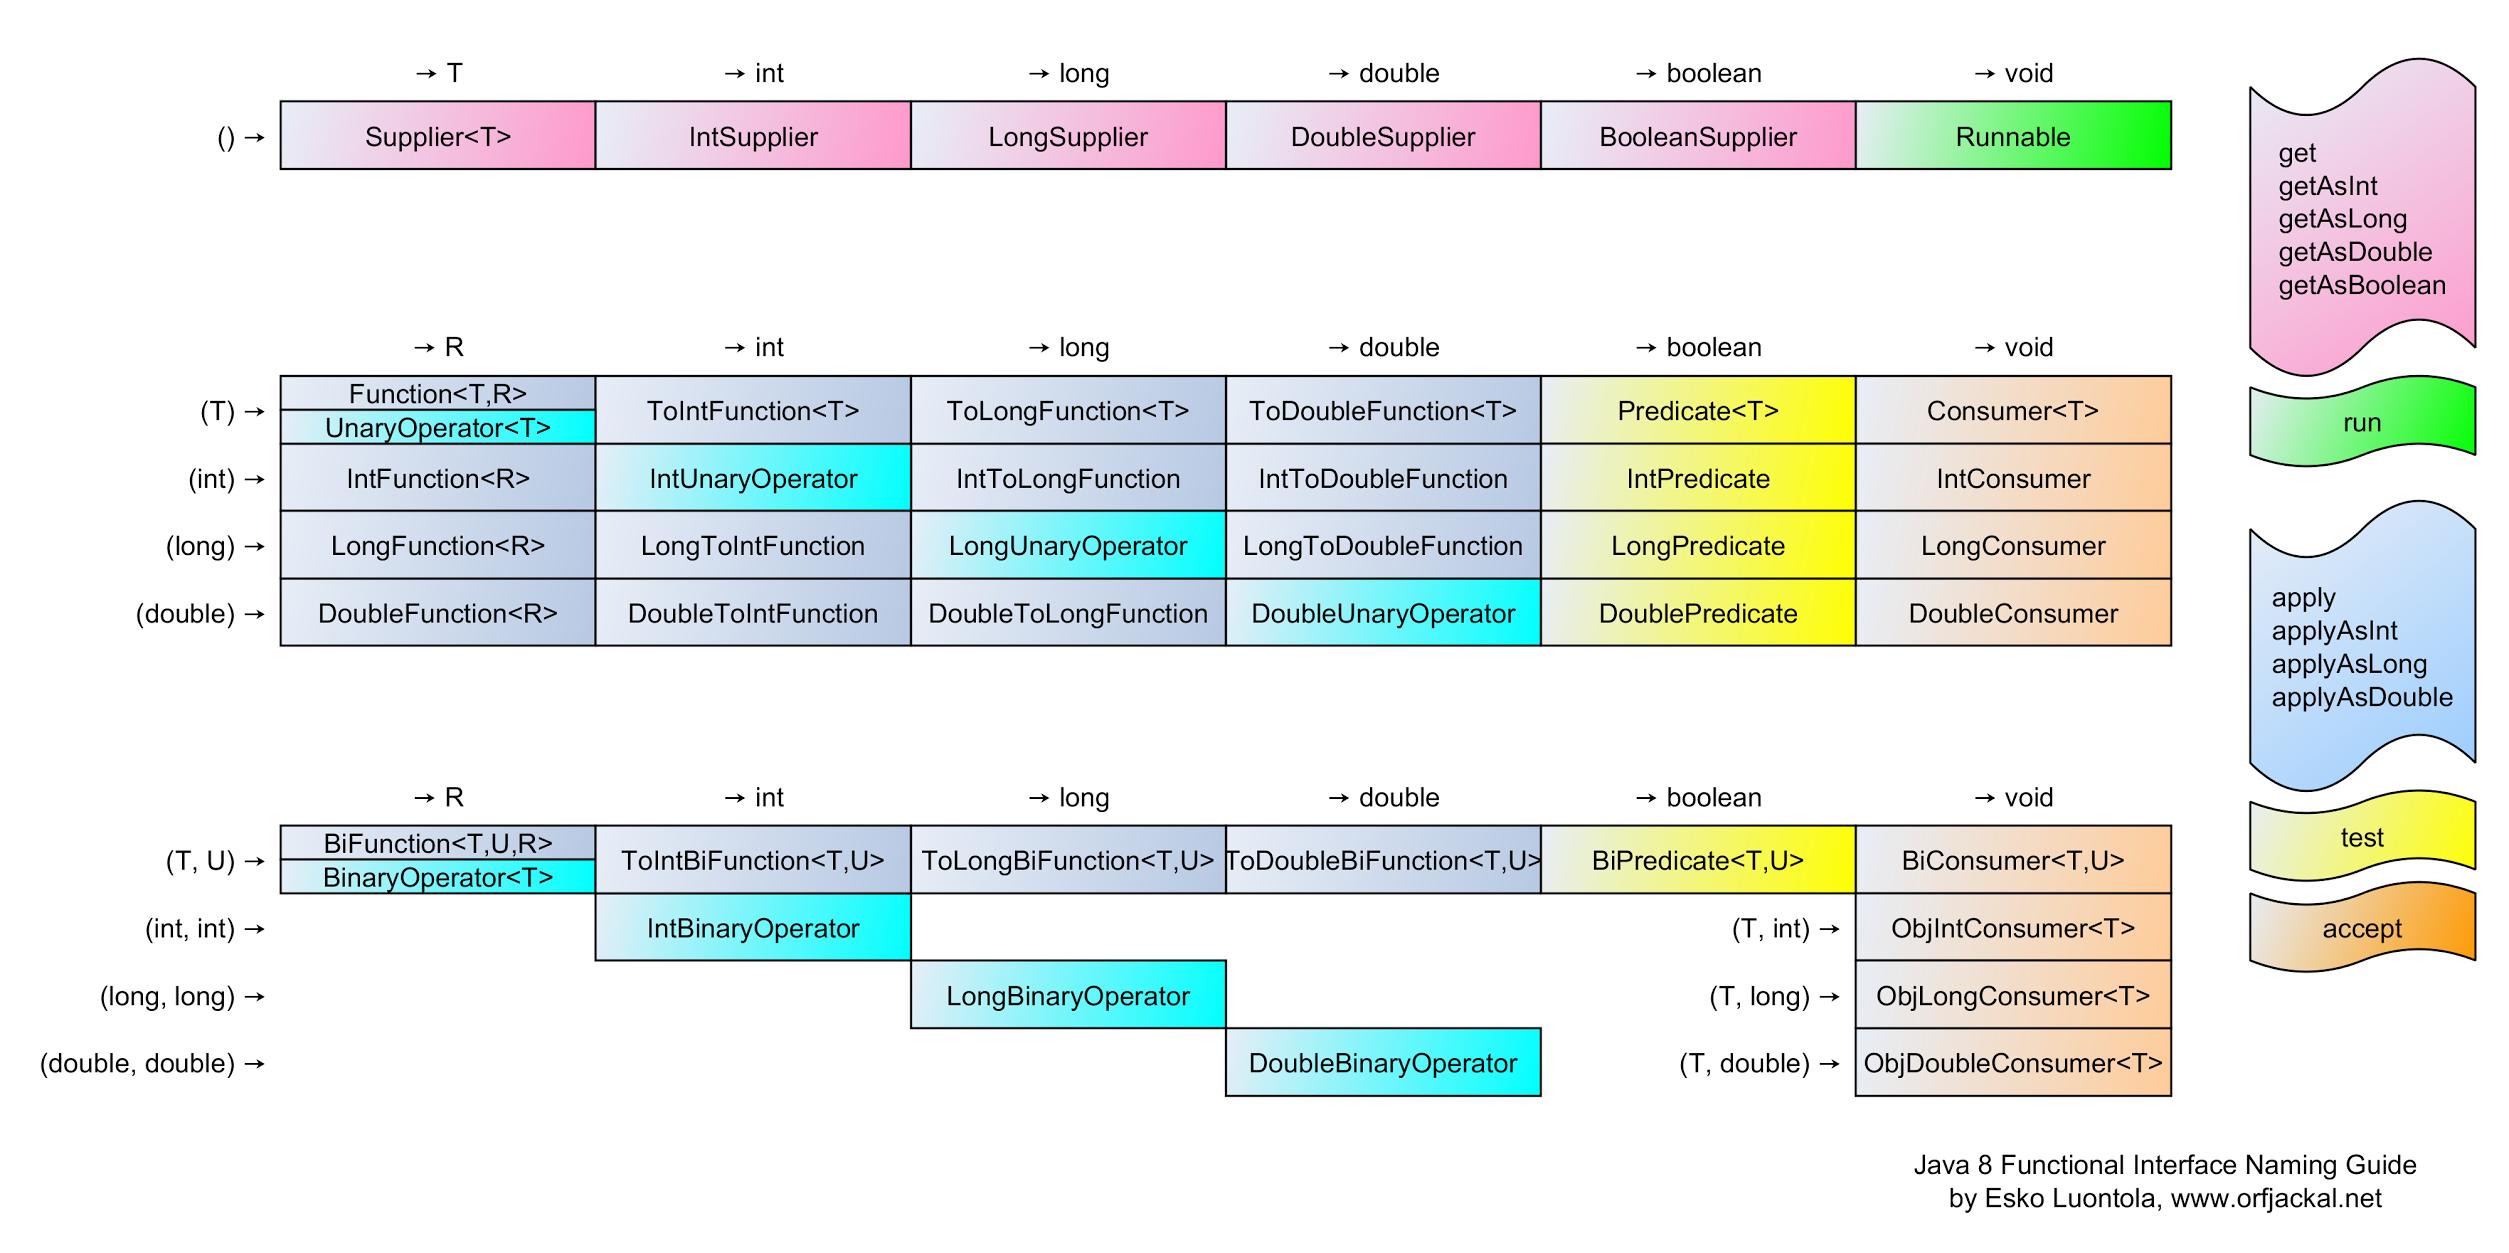 Java 8 Functional Interface Naming Guide